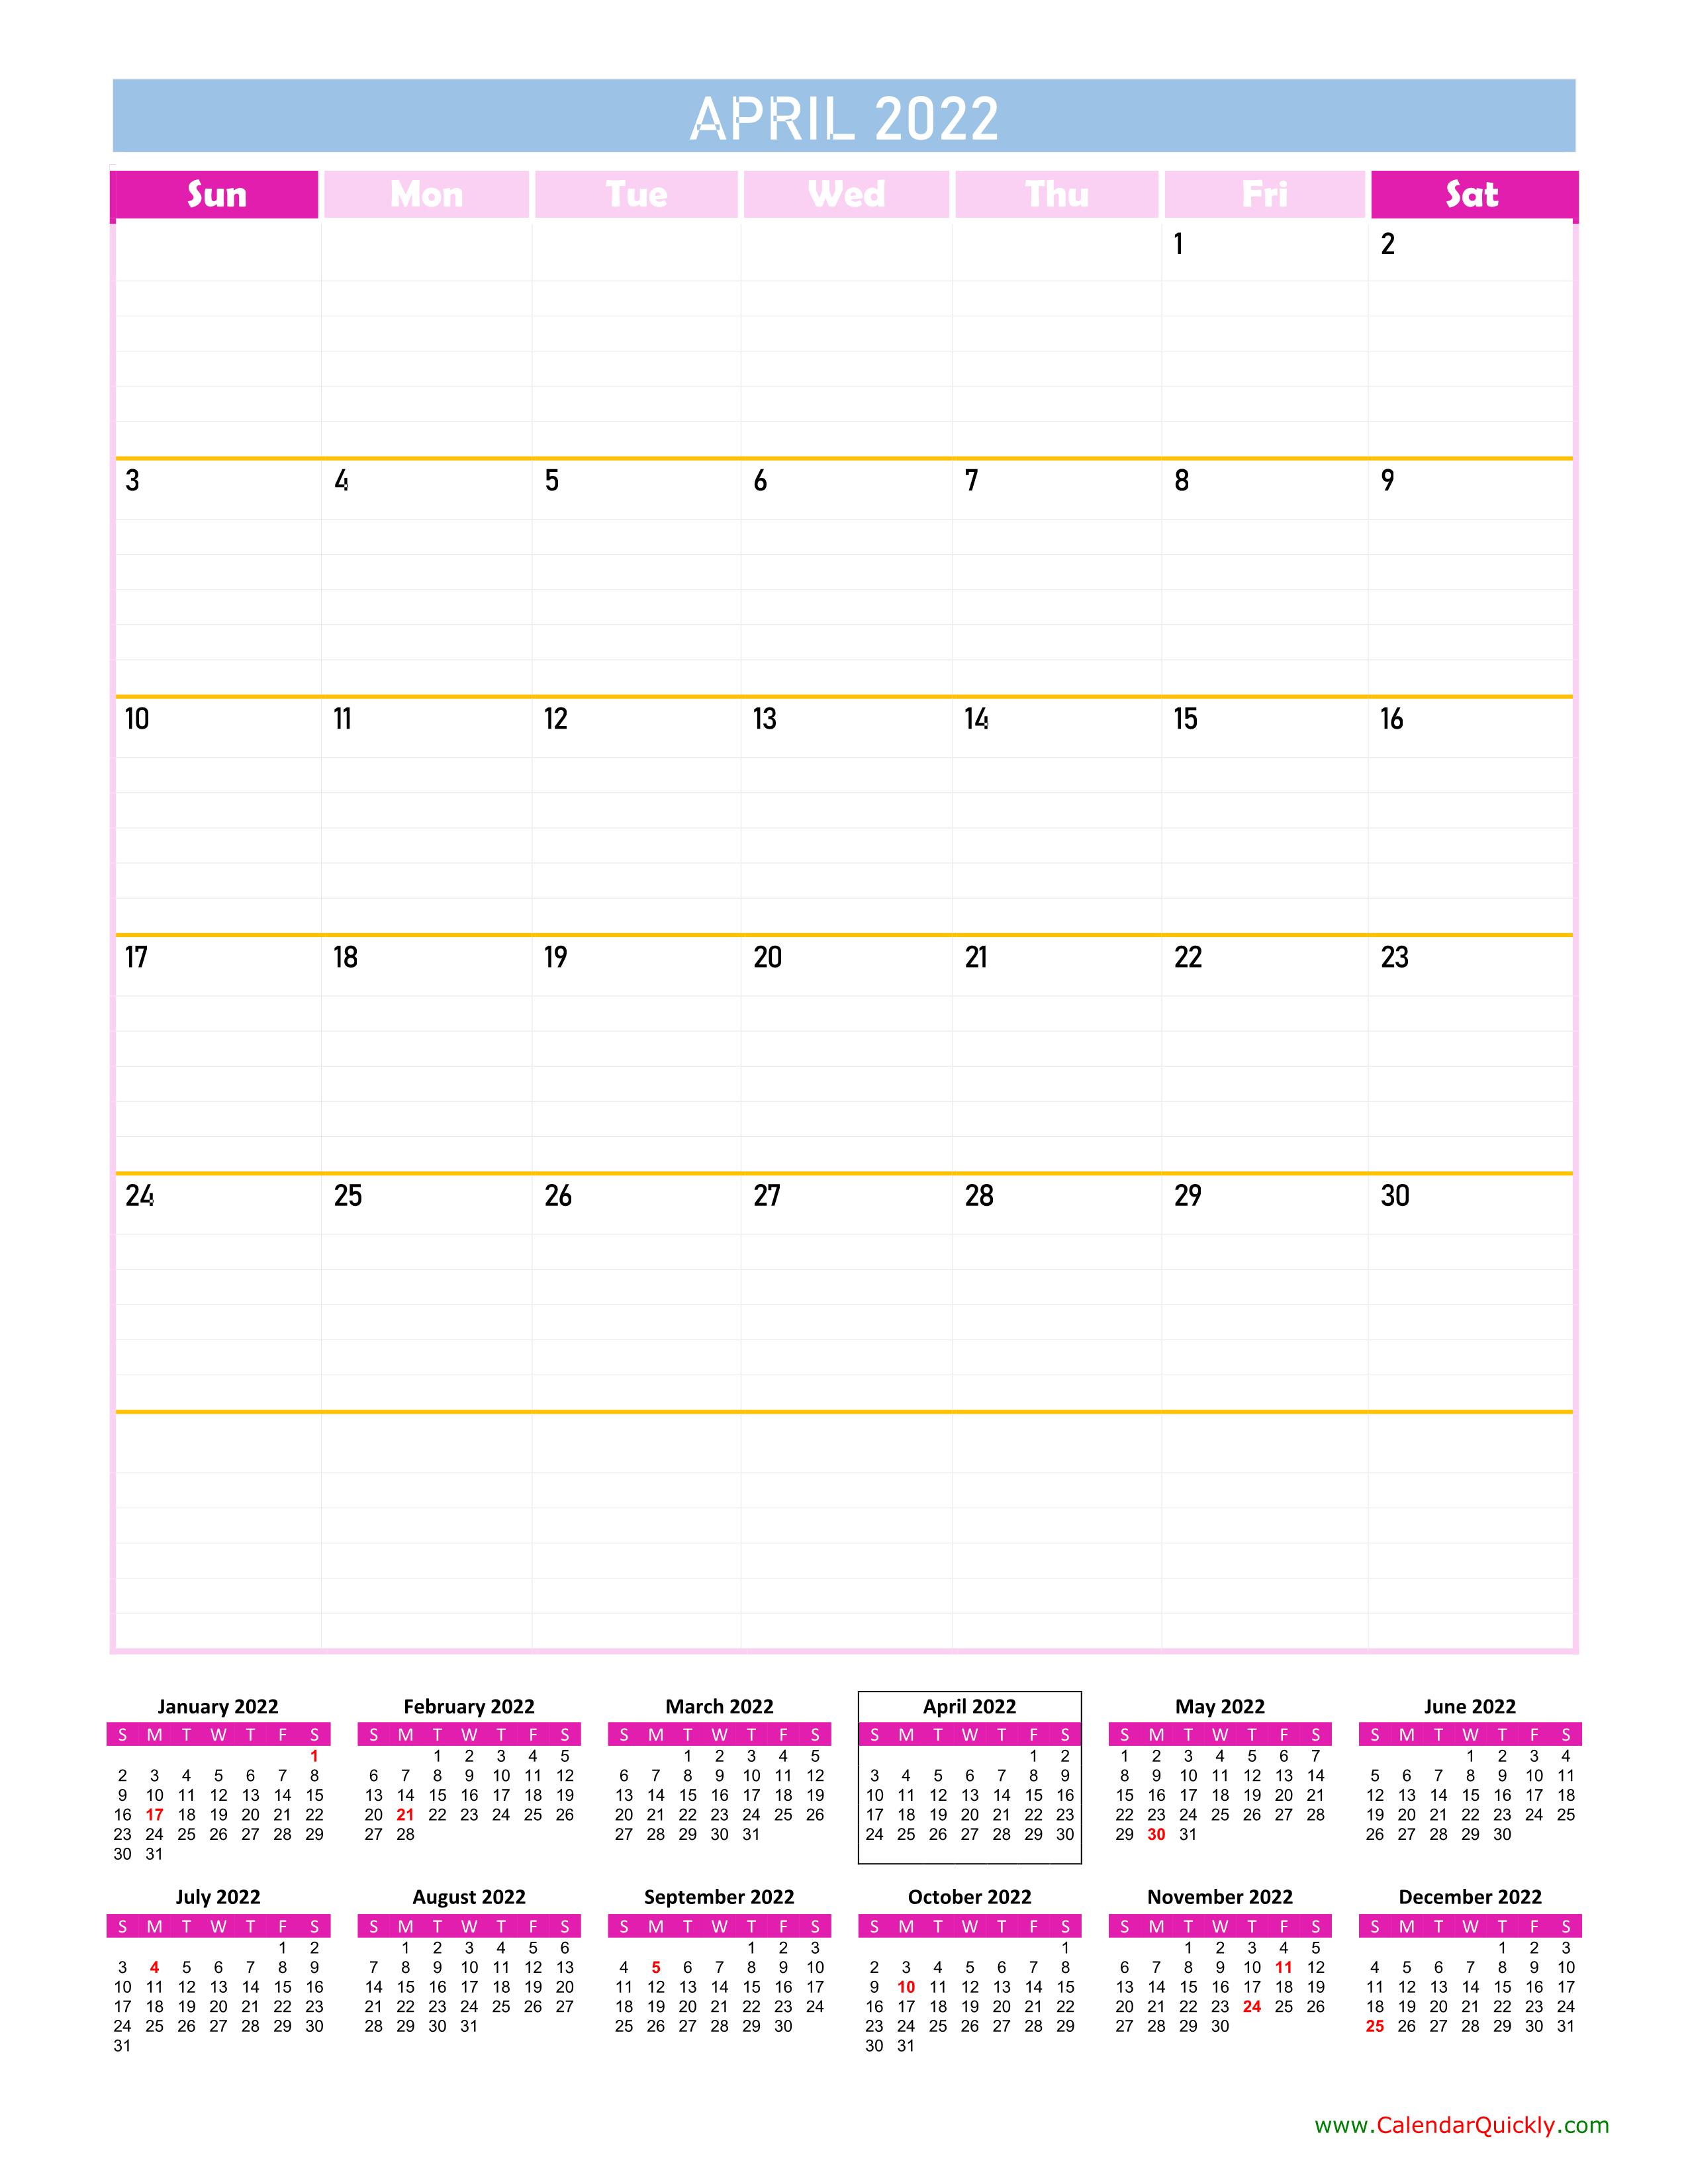 April Calendar 2022 Vertical | Calendar Quickly Regarding March April May 2022 Calendar Print